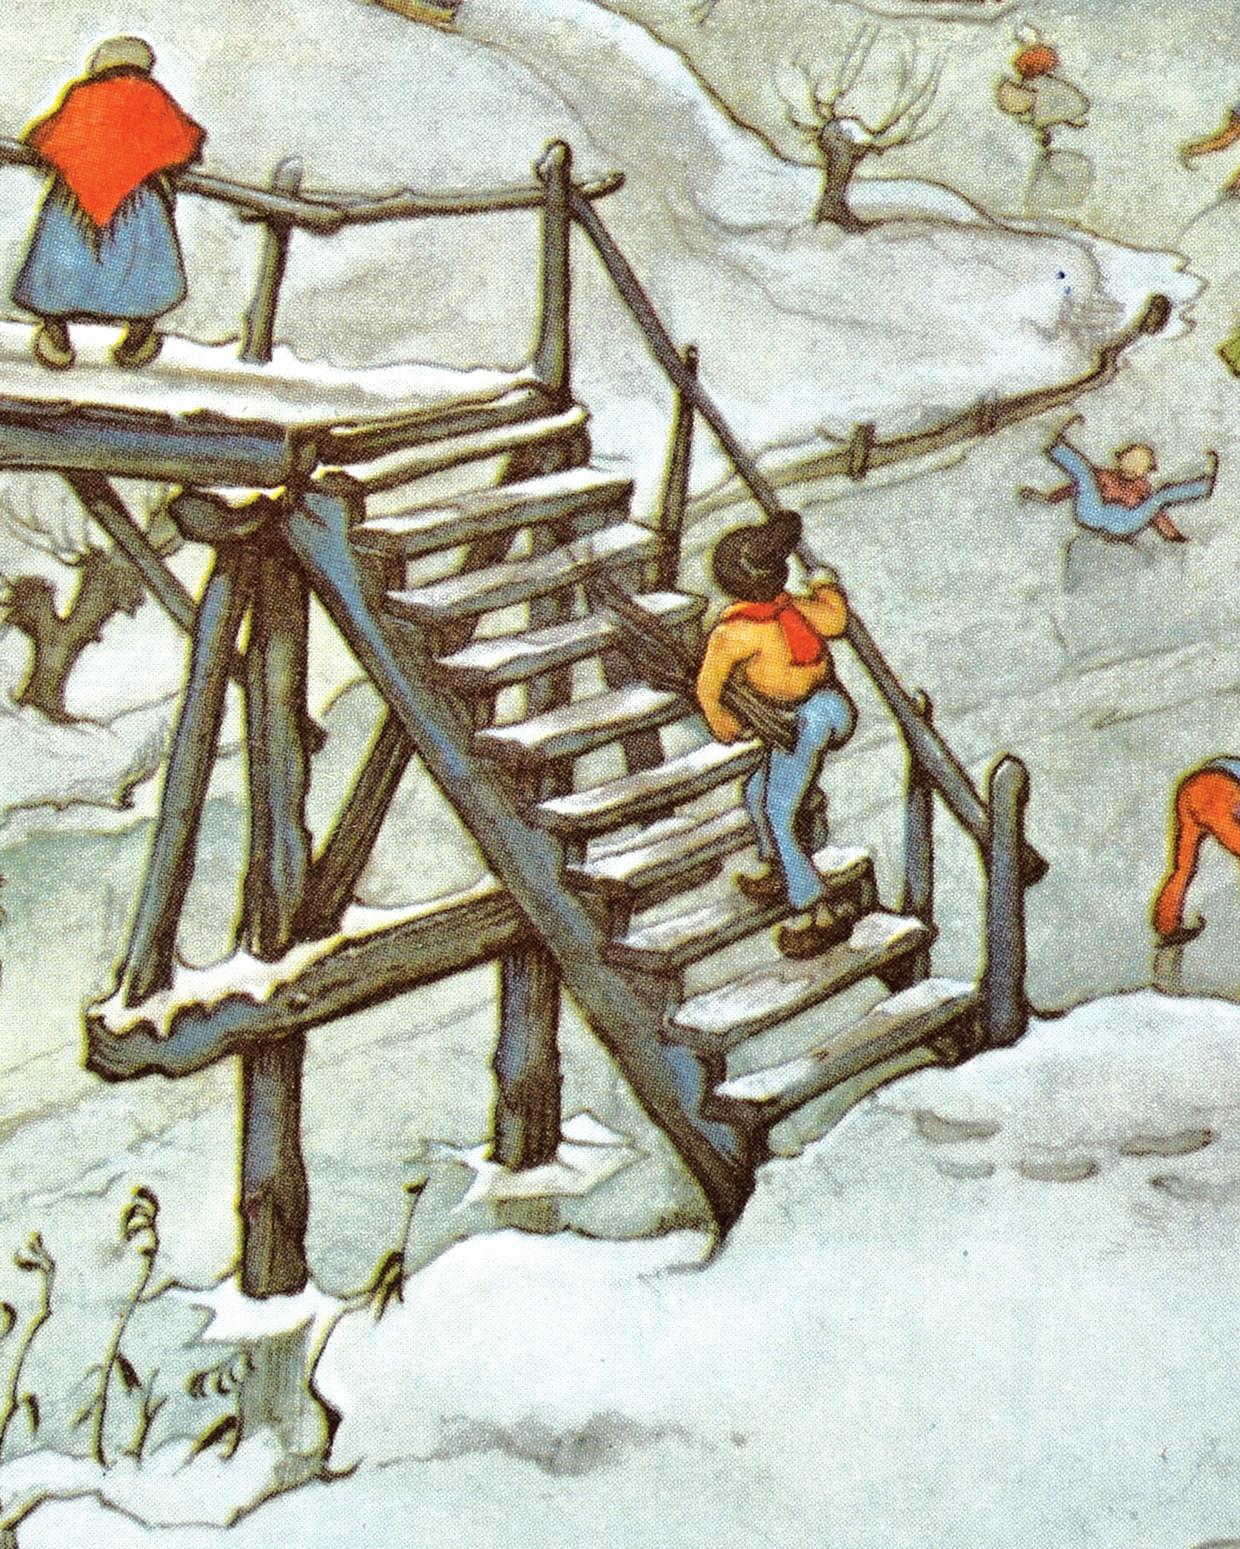 Detail uit IJstafereel, arrenslee onder houten brug, 1969, aquarel, 15 x 21,5 cm, kalenderplaat voor de maand januari van Anton Pieck. Beeld Anton Pieck, licensed by Orange Licensing BV